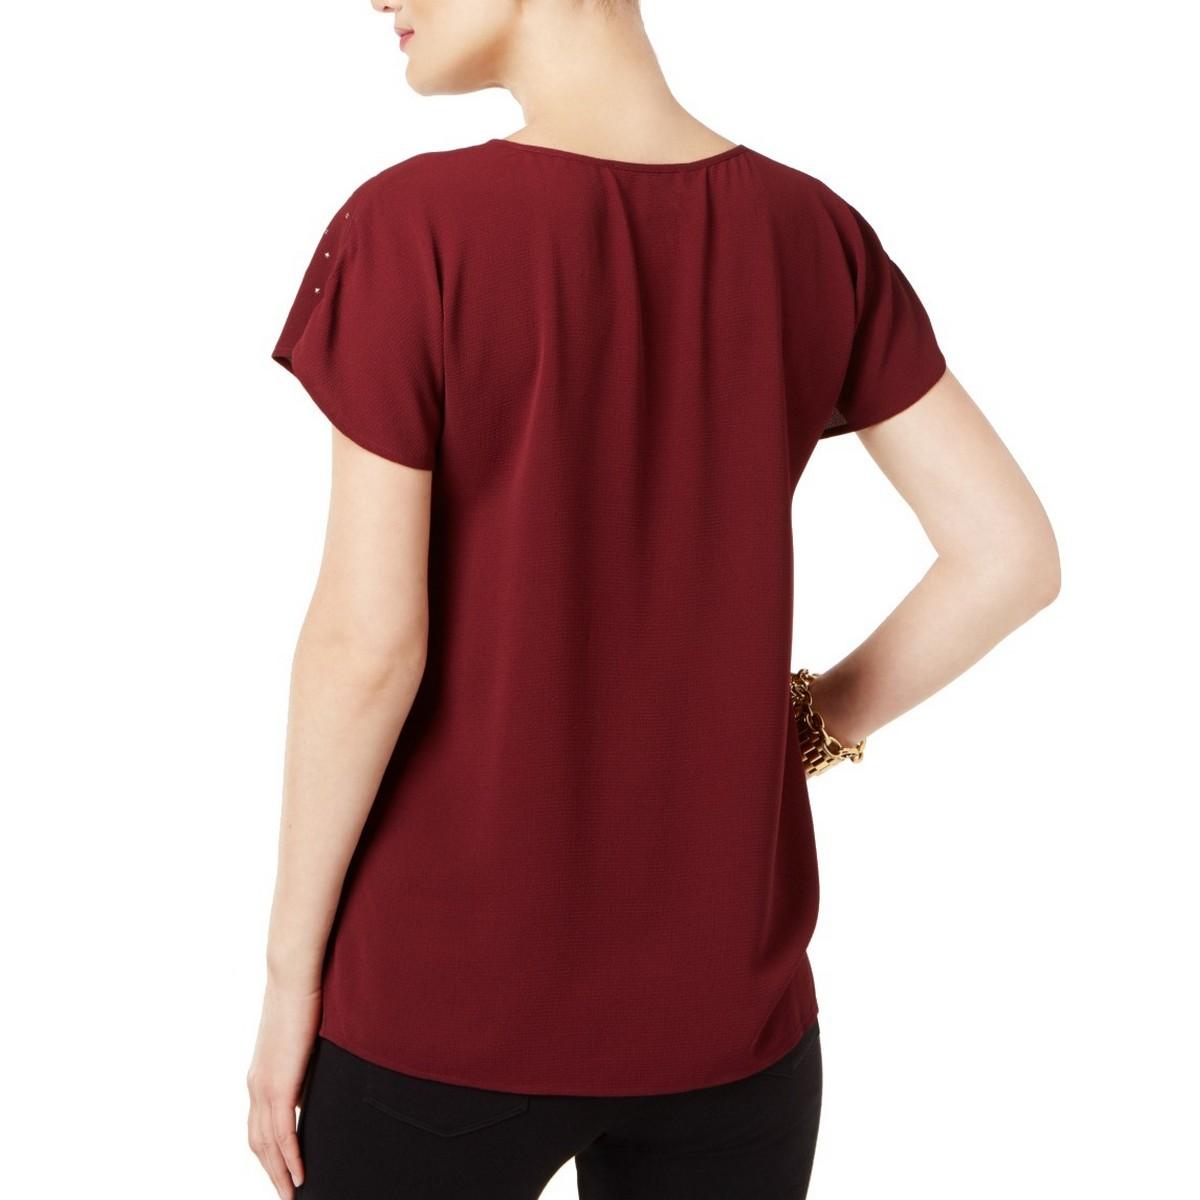 MICHAEL-KORS-NEW-Women-039-s-Petite-Star-embellished-Blouse-Shirt-Top-TEDO thumbnail 4